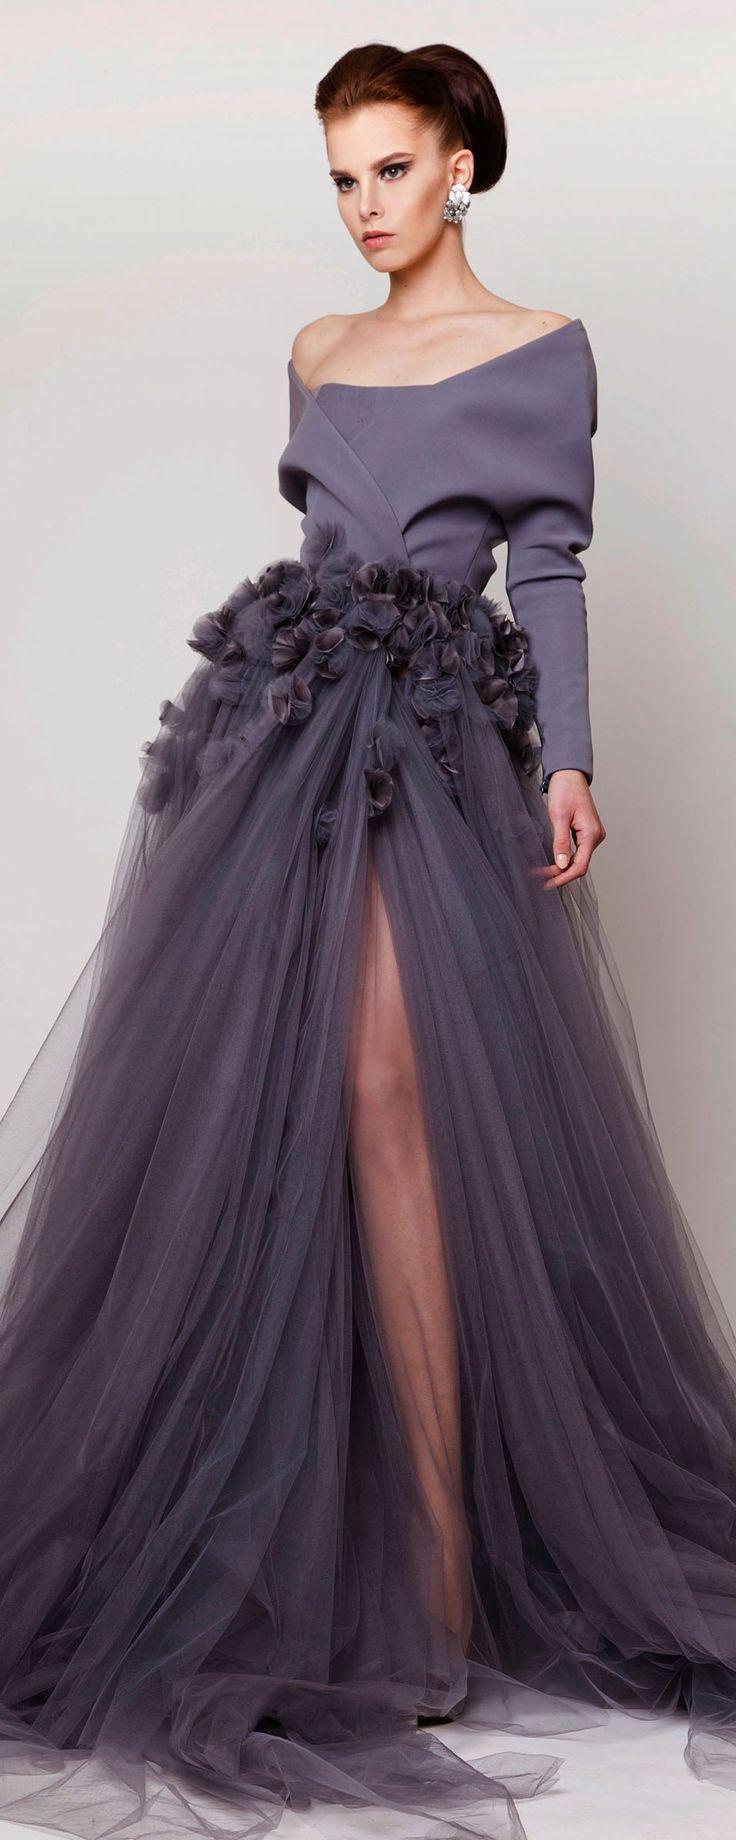 13 best occasion wear images on Pinterest | Formal prom dresses ...